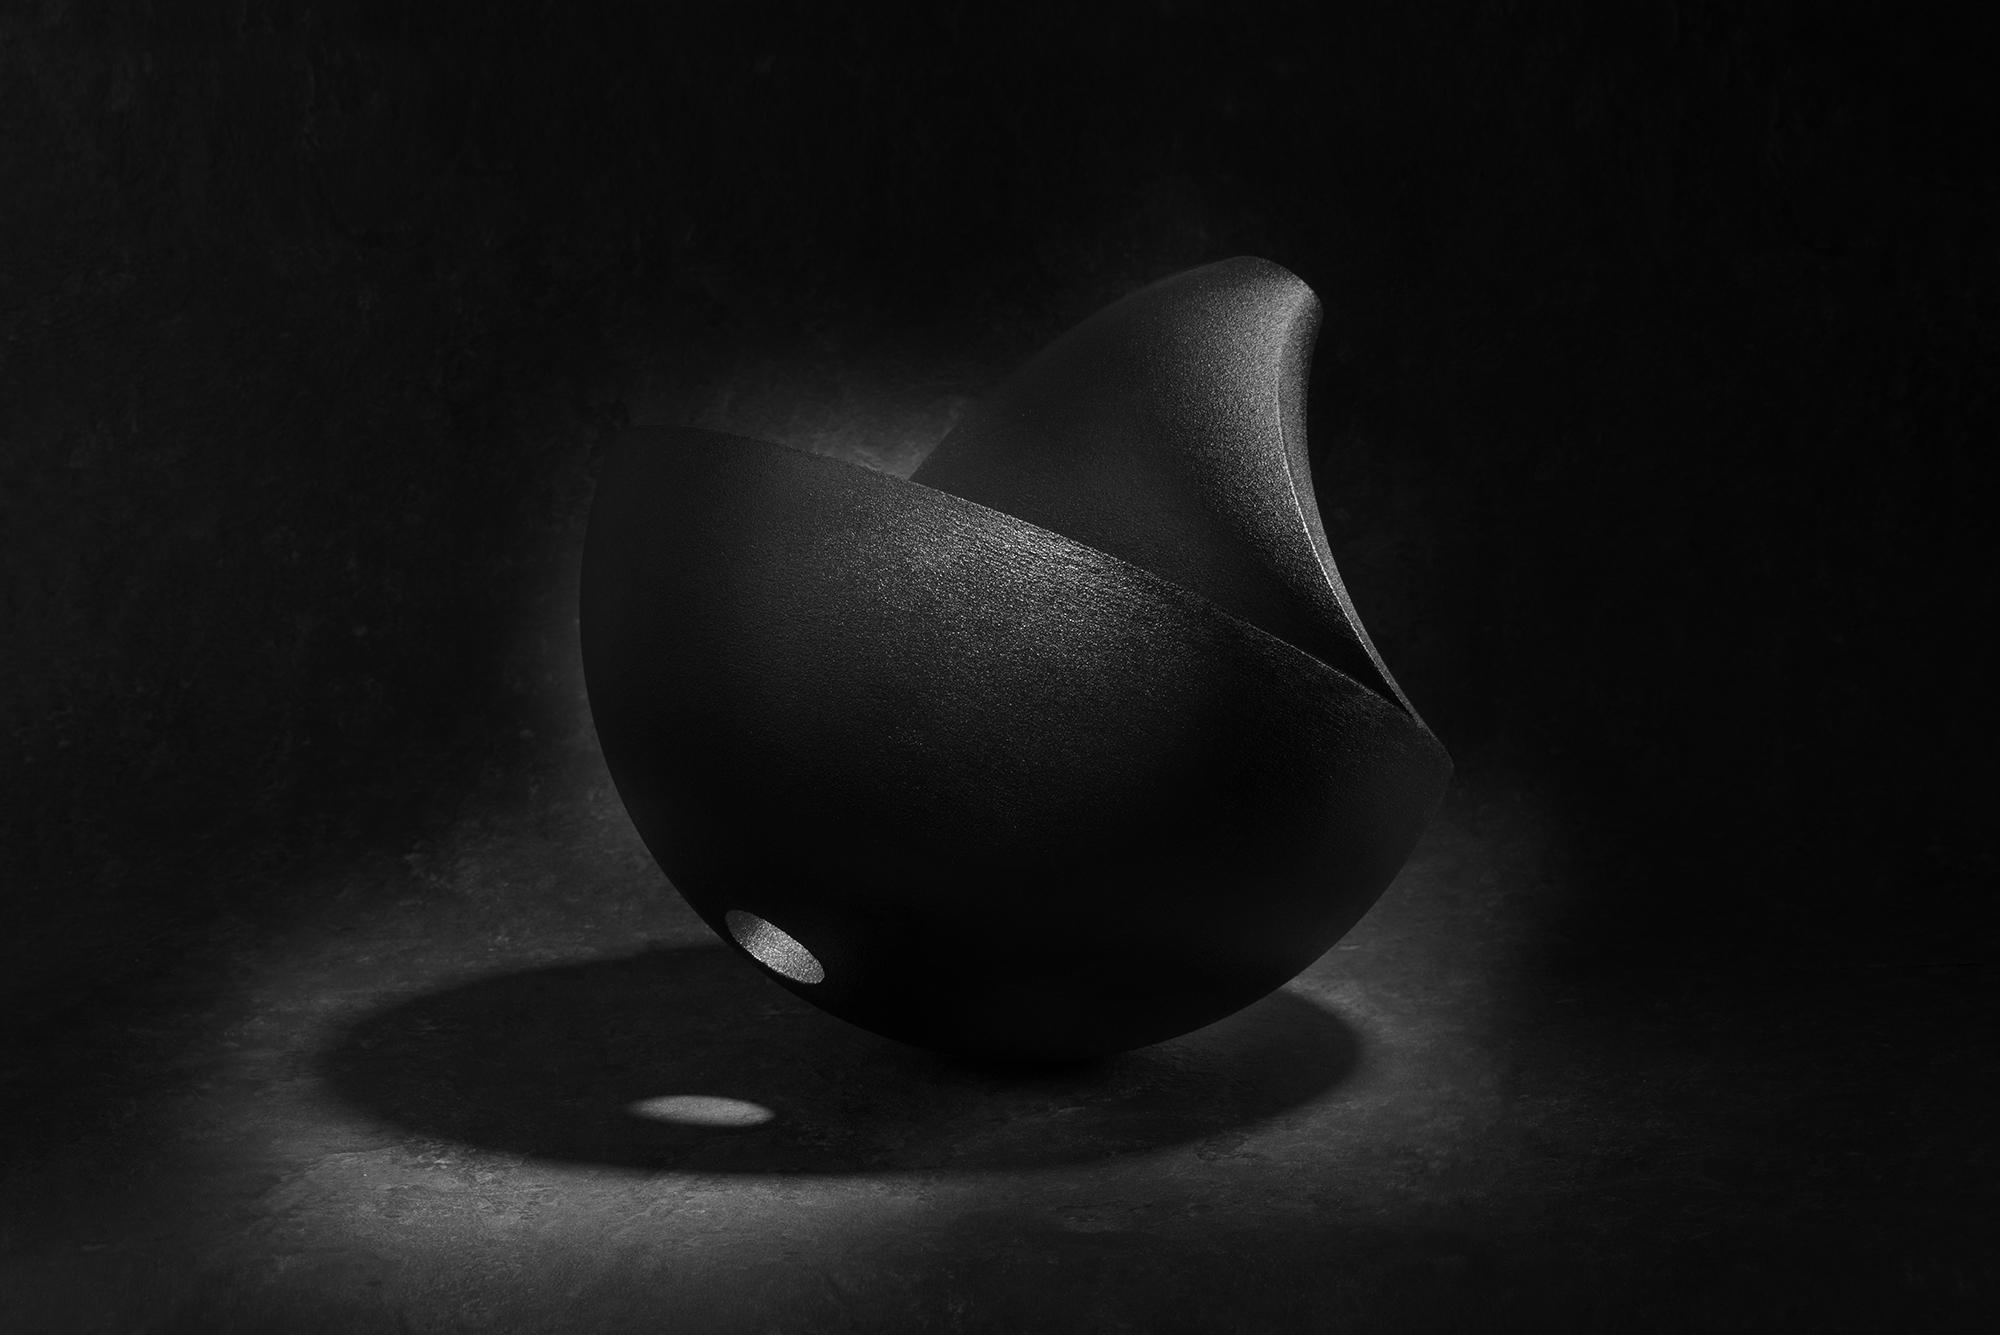 Hemi-Sphere III